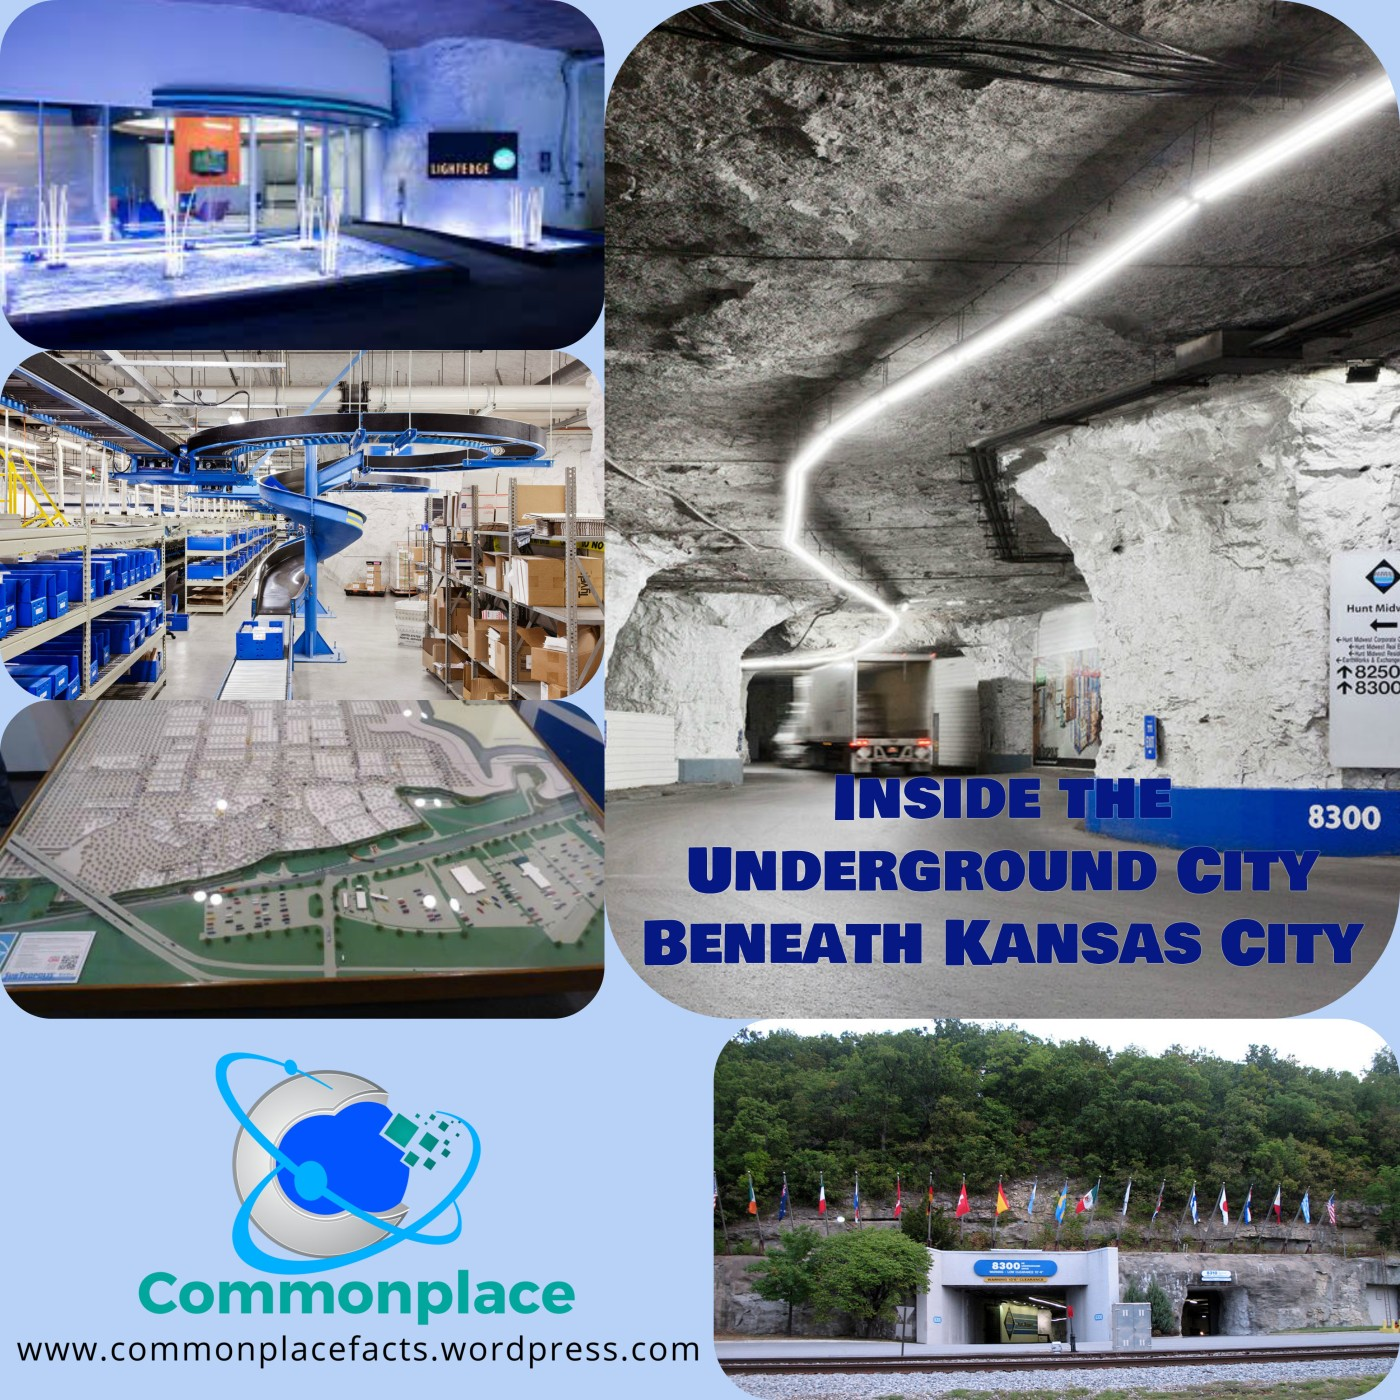 #subtropolis #underground #caves #kansascity